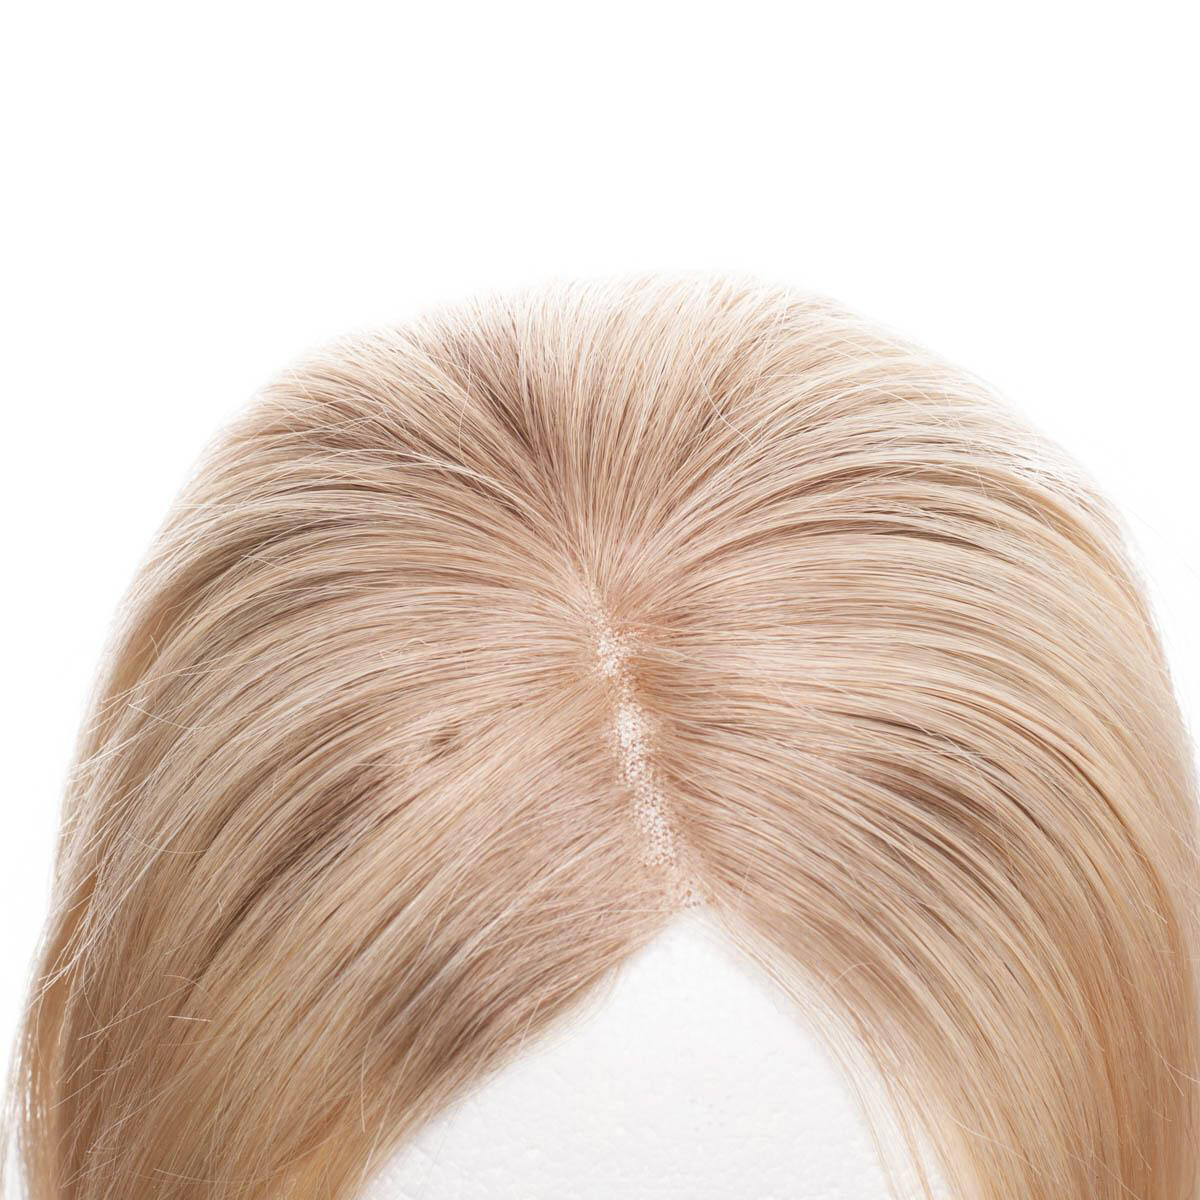 Top Piece For more volume R7.3/8.0 Cendre Golden Blonde Root 30 cm